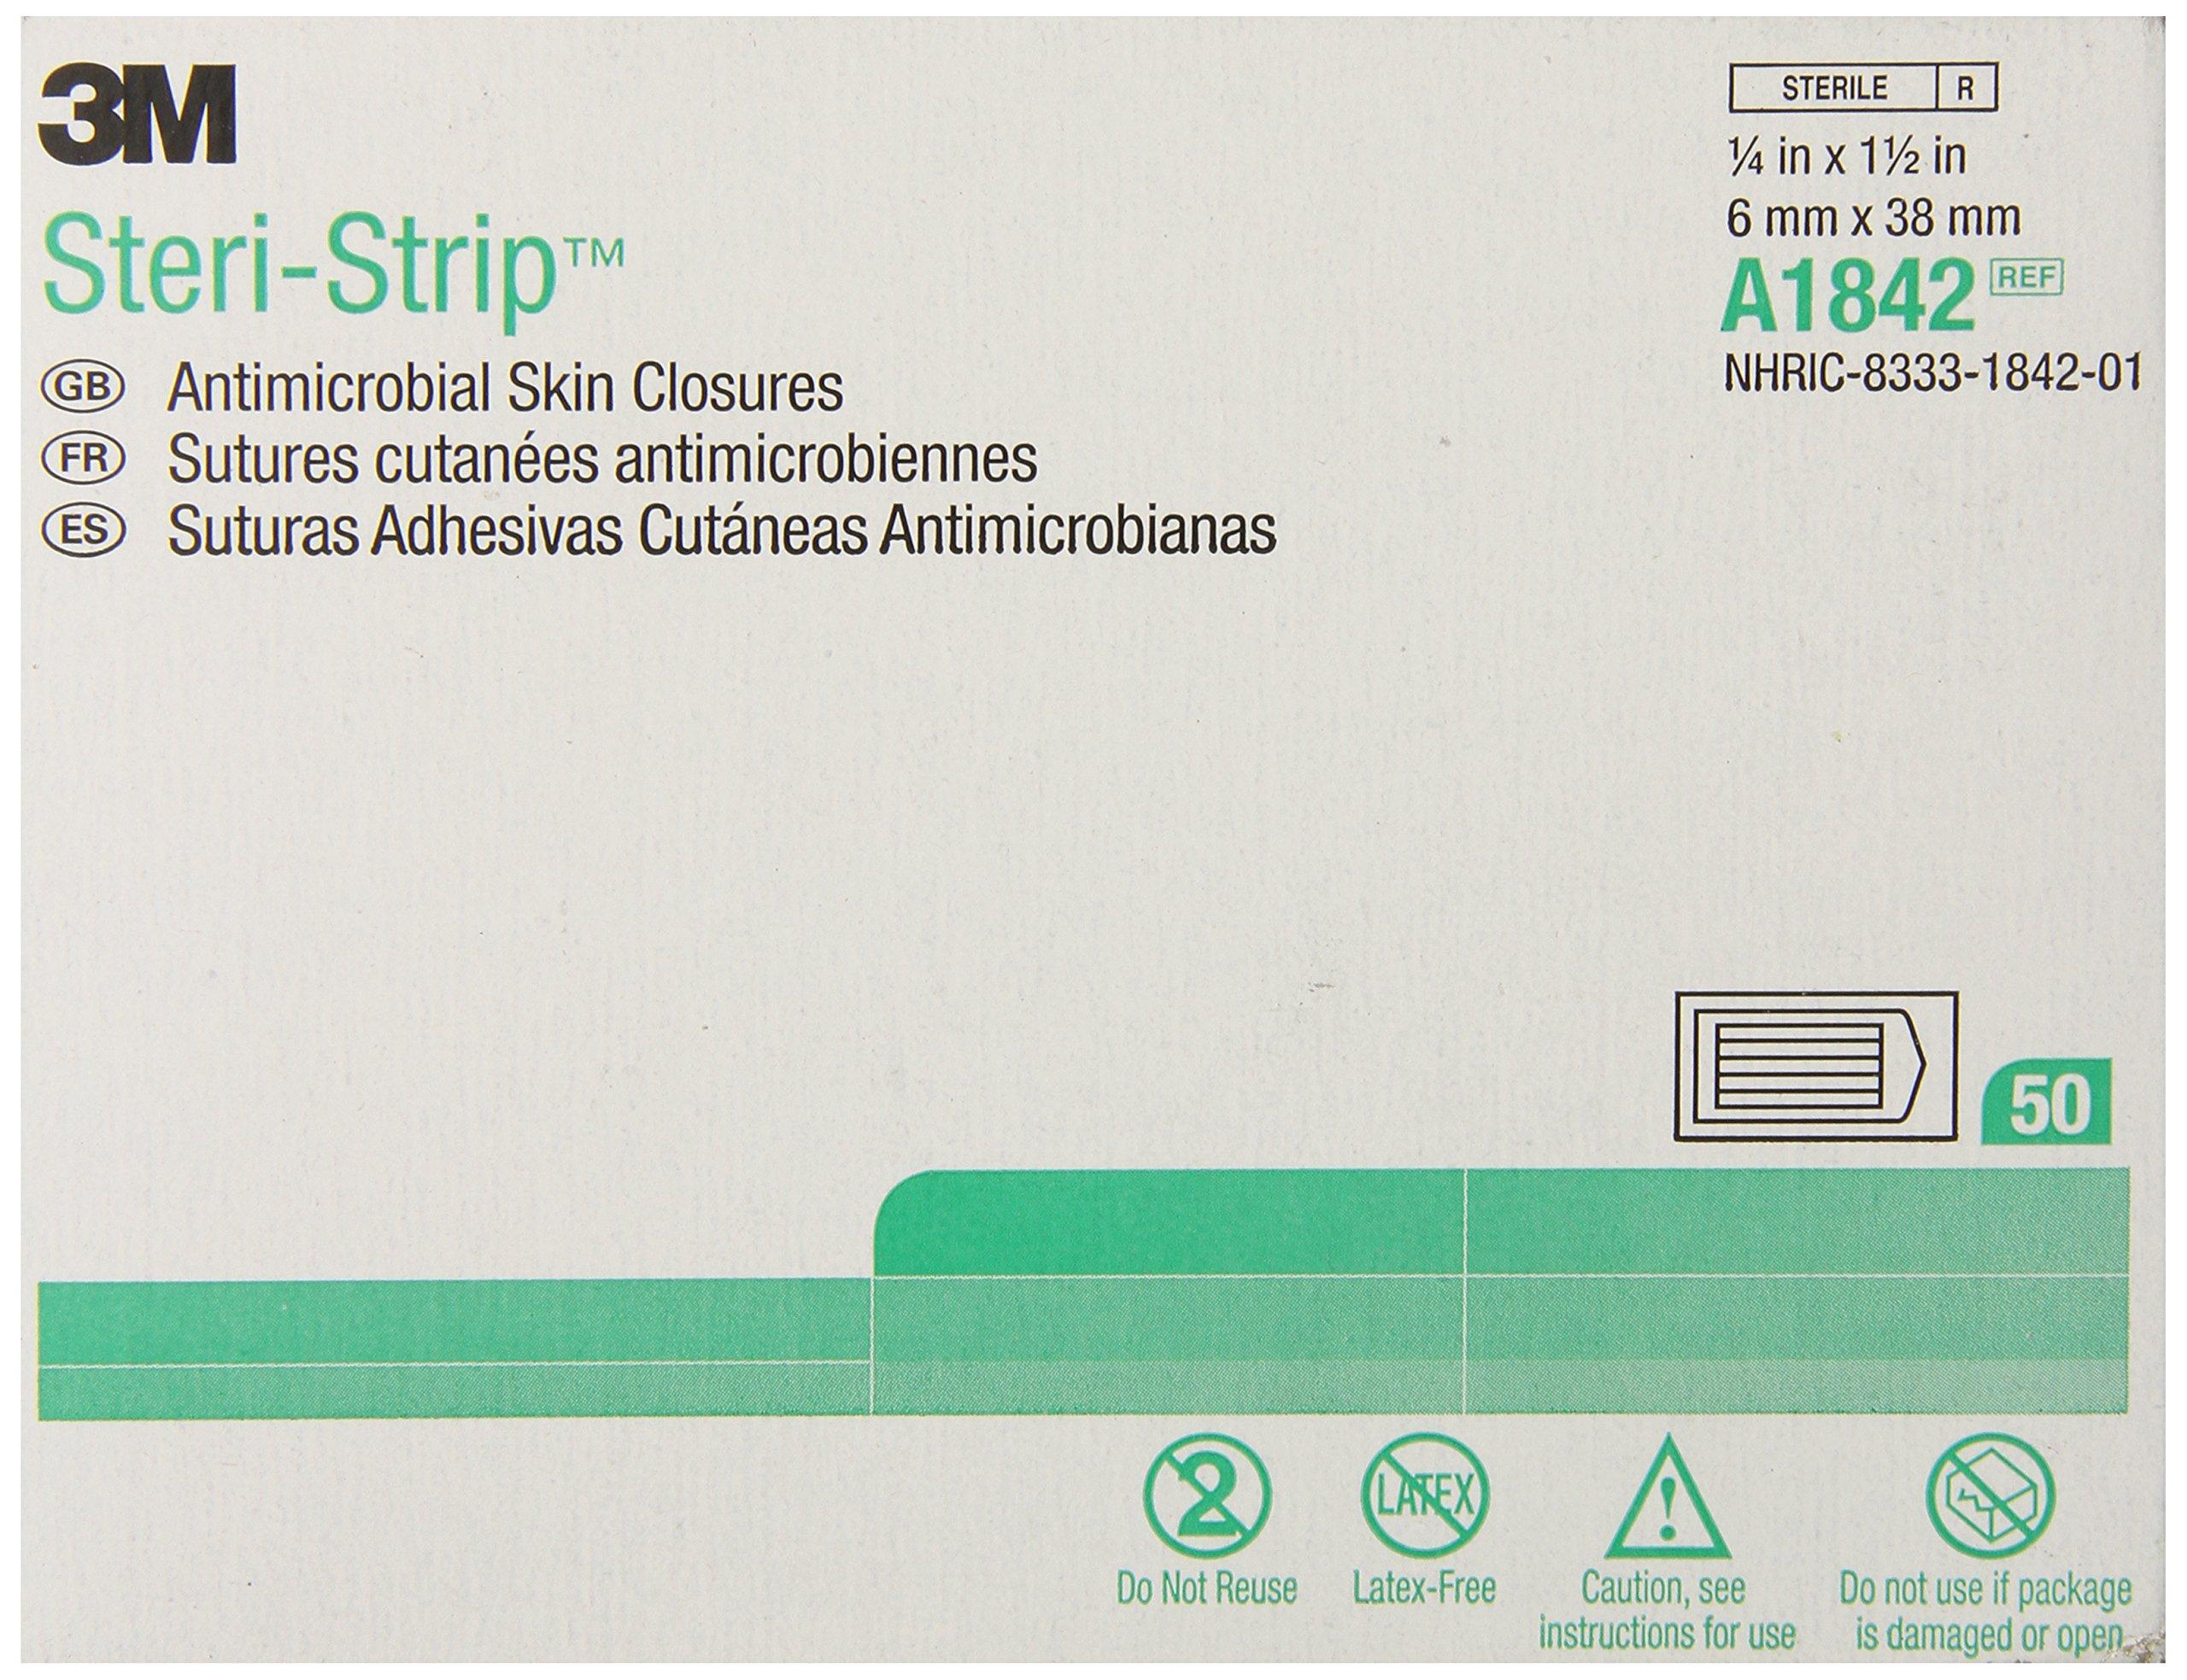 3M Steri-Strip Antimicrobial Skin Closures A1842, 50 Bags